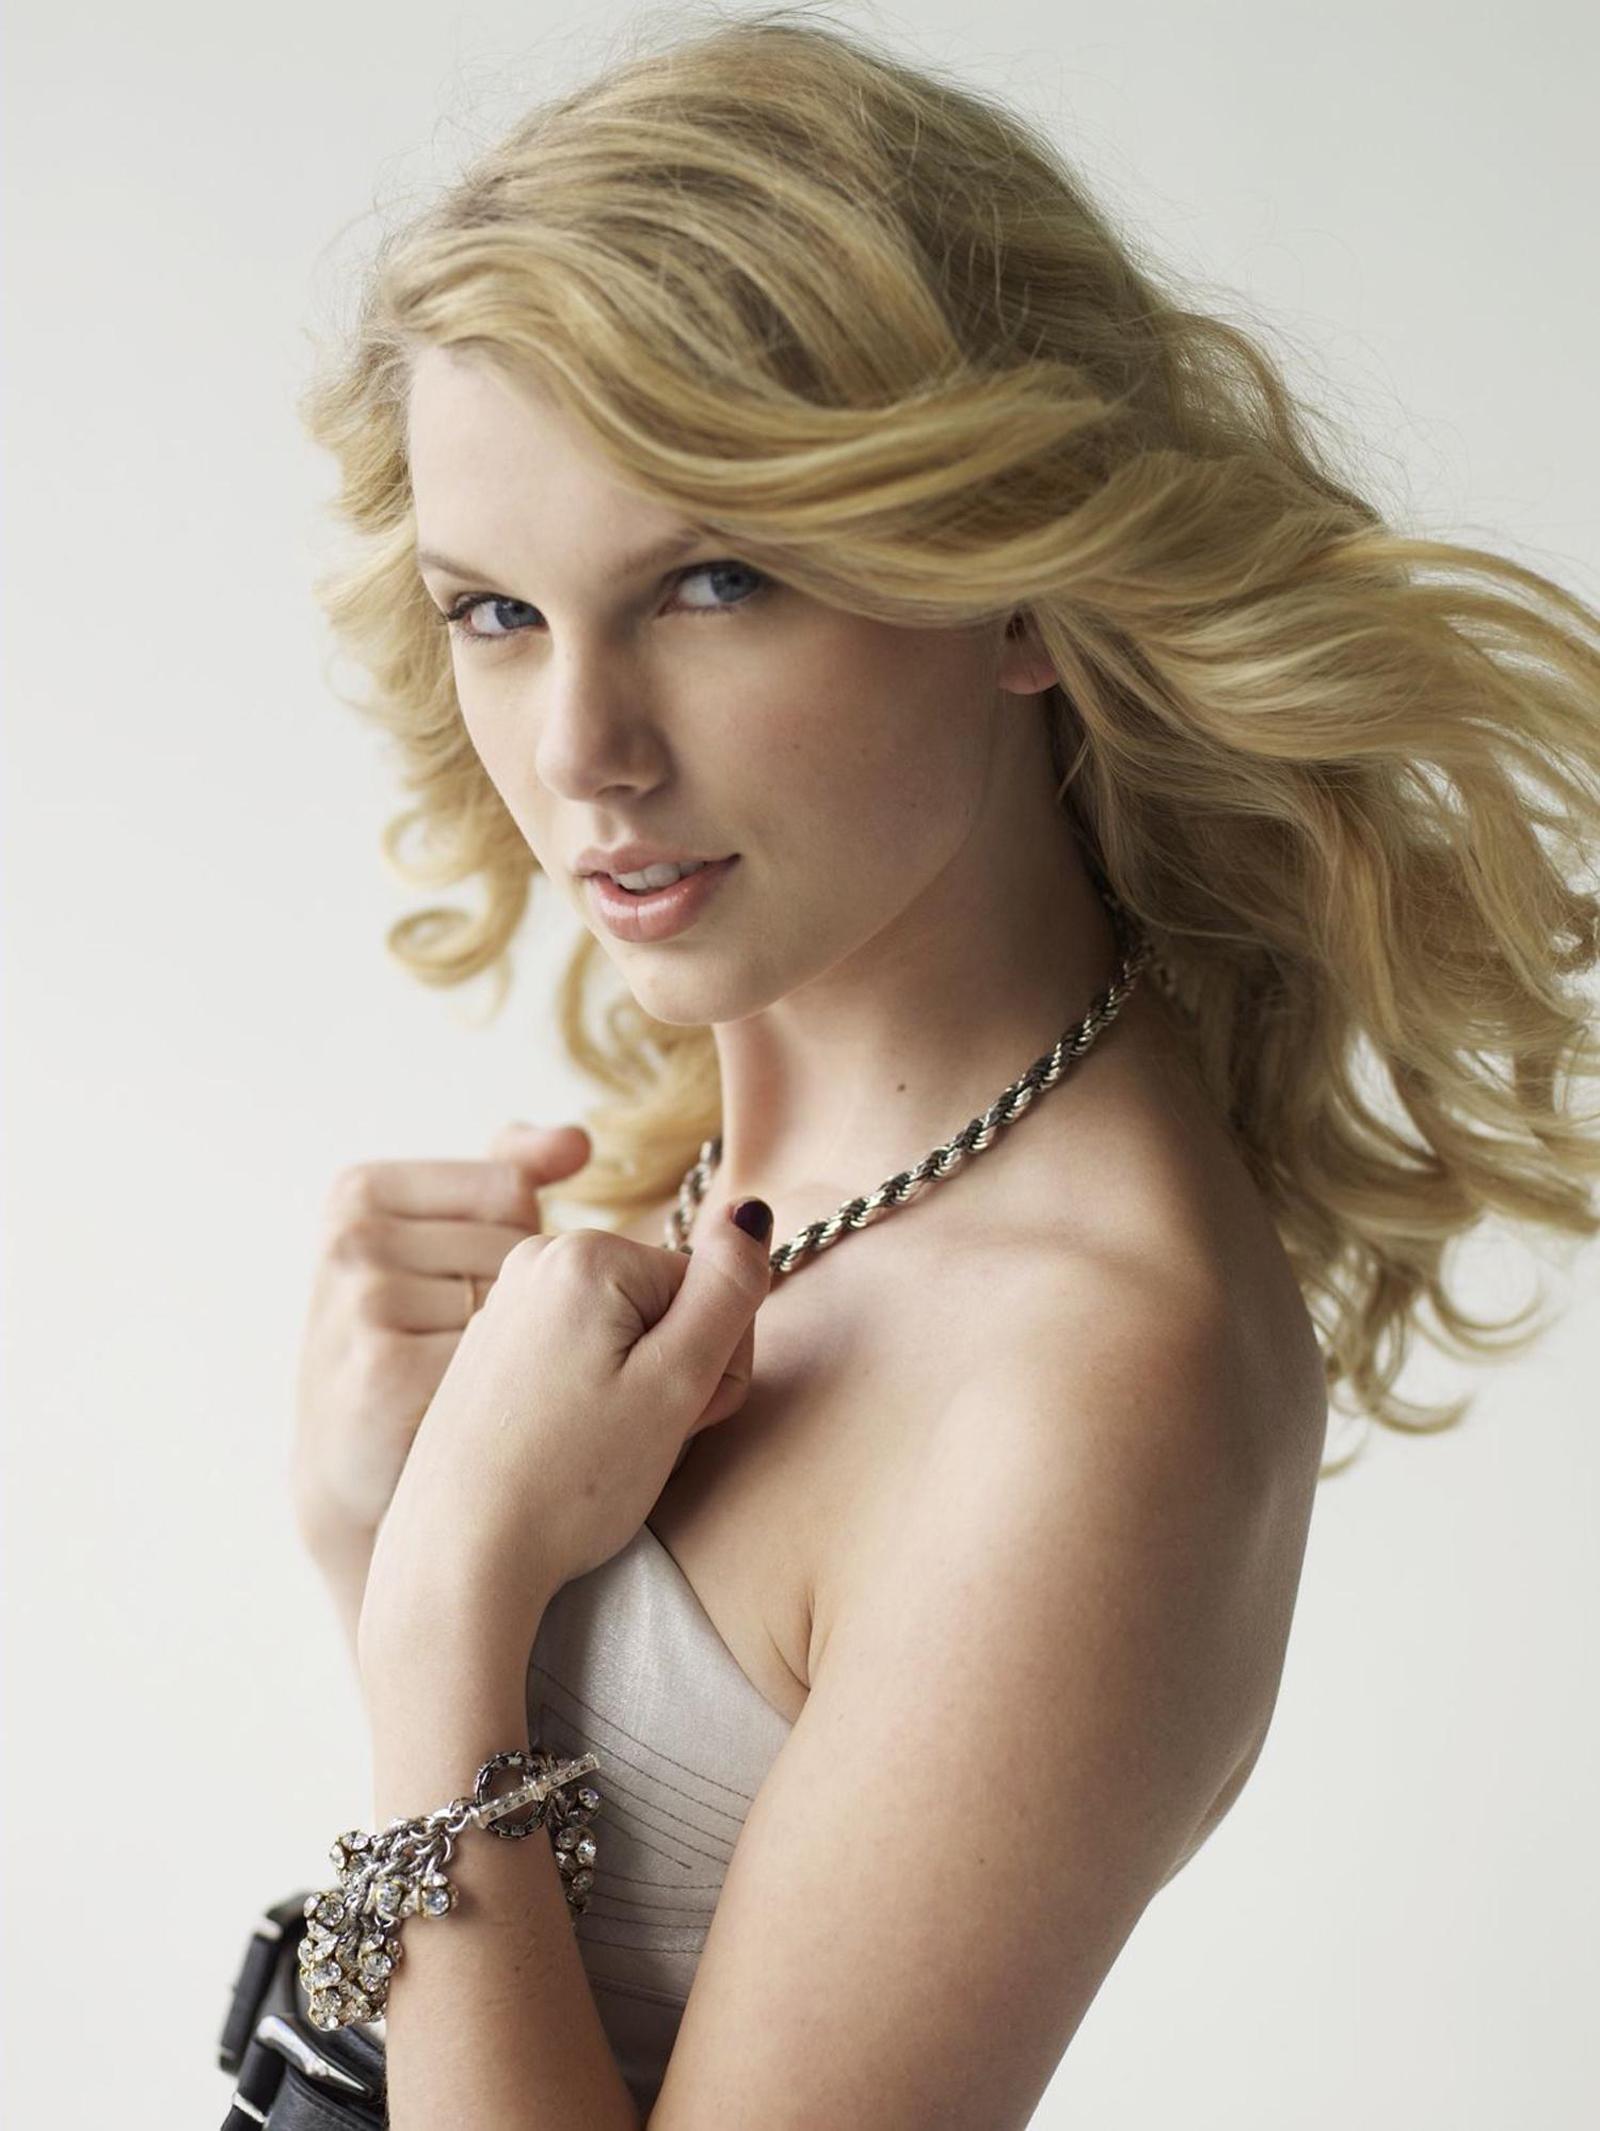 53288_Taylor_Swift_2008_PHOTOSHOOT_01_122_135lo.jpg